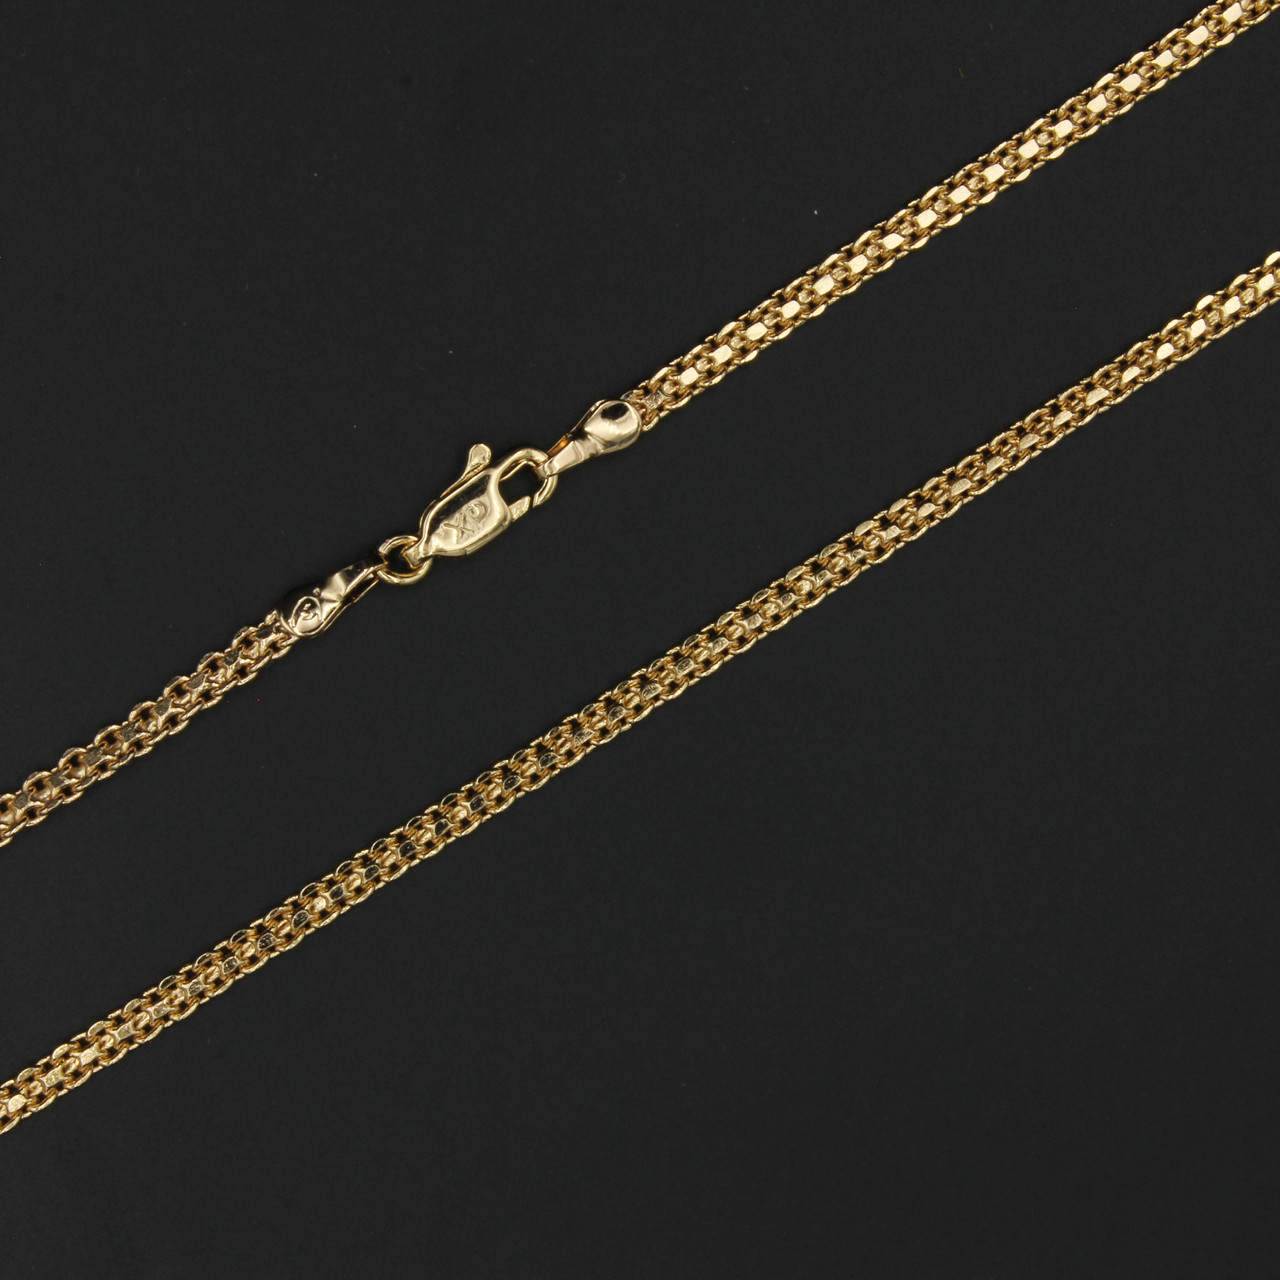 Ланцюг Бісмарк-45, плетення бісмарк, 45см